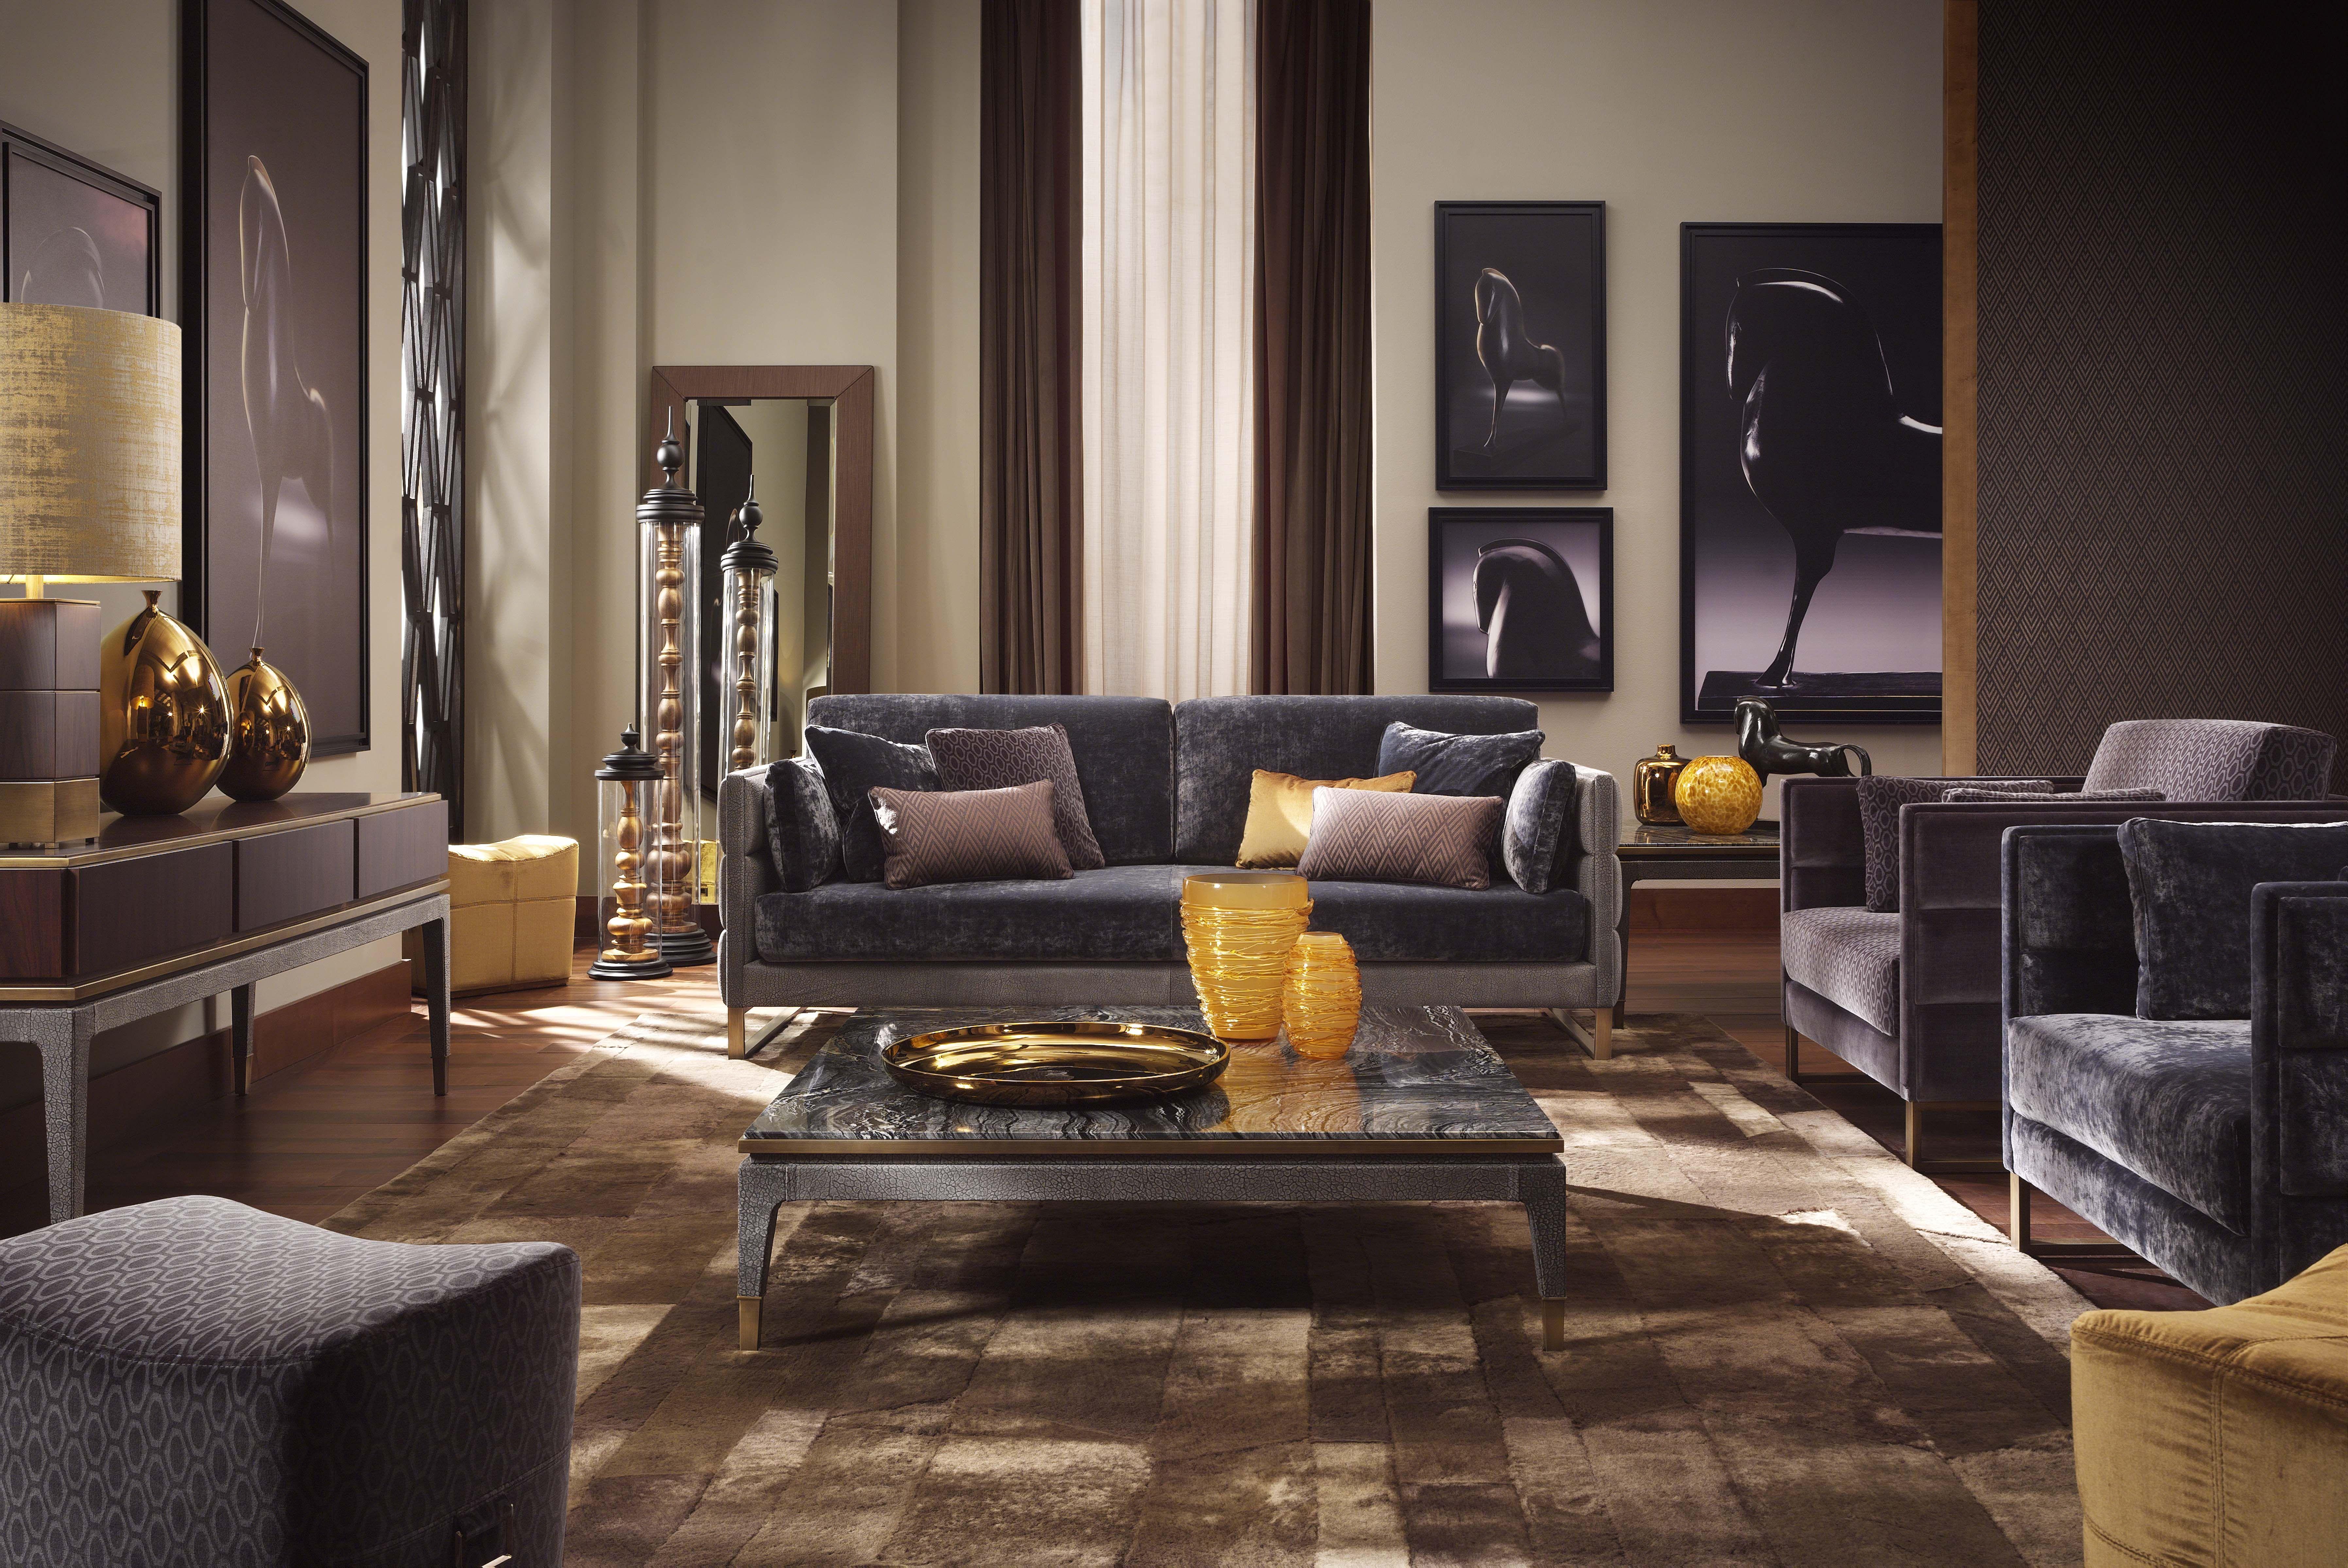 Mobili smania ~ Home couture from smania ffe concepts interiors